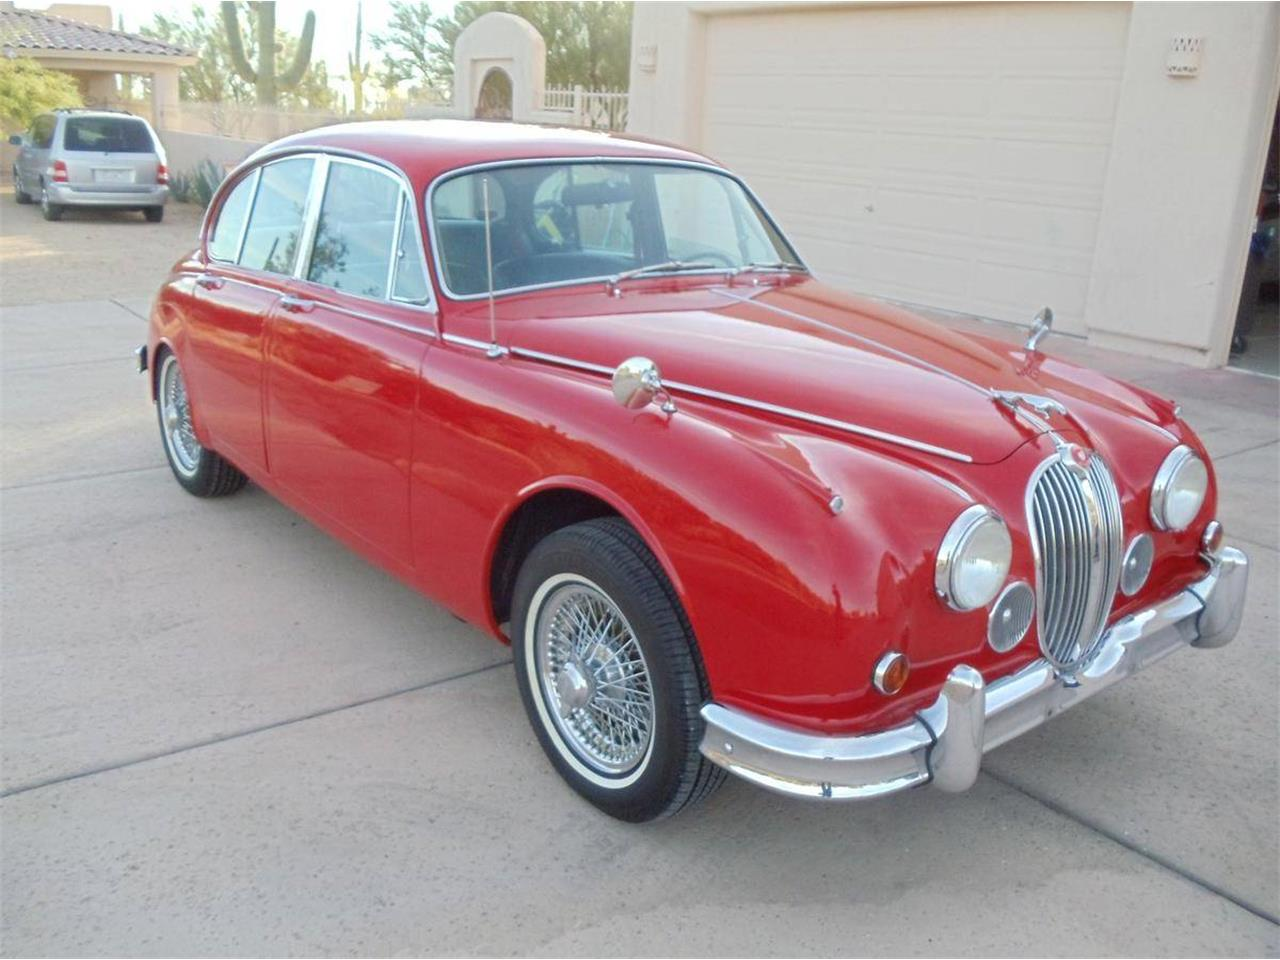 1967 Jaguar Mark II for Sale | ClassicCars.com | CC-935572